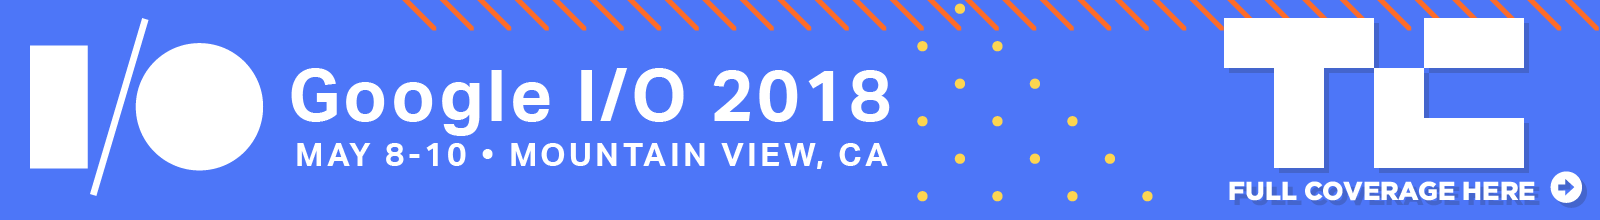 google io 2018 banner 6